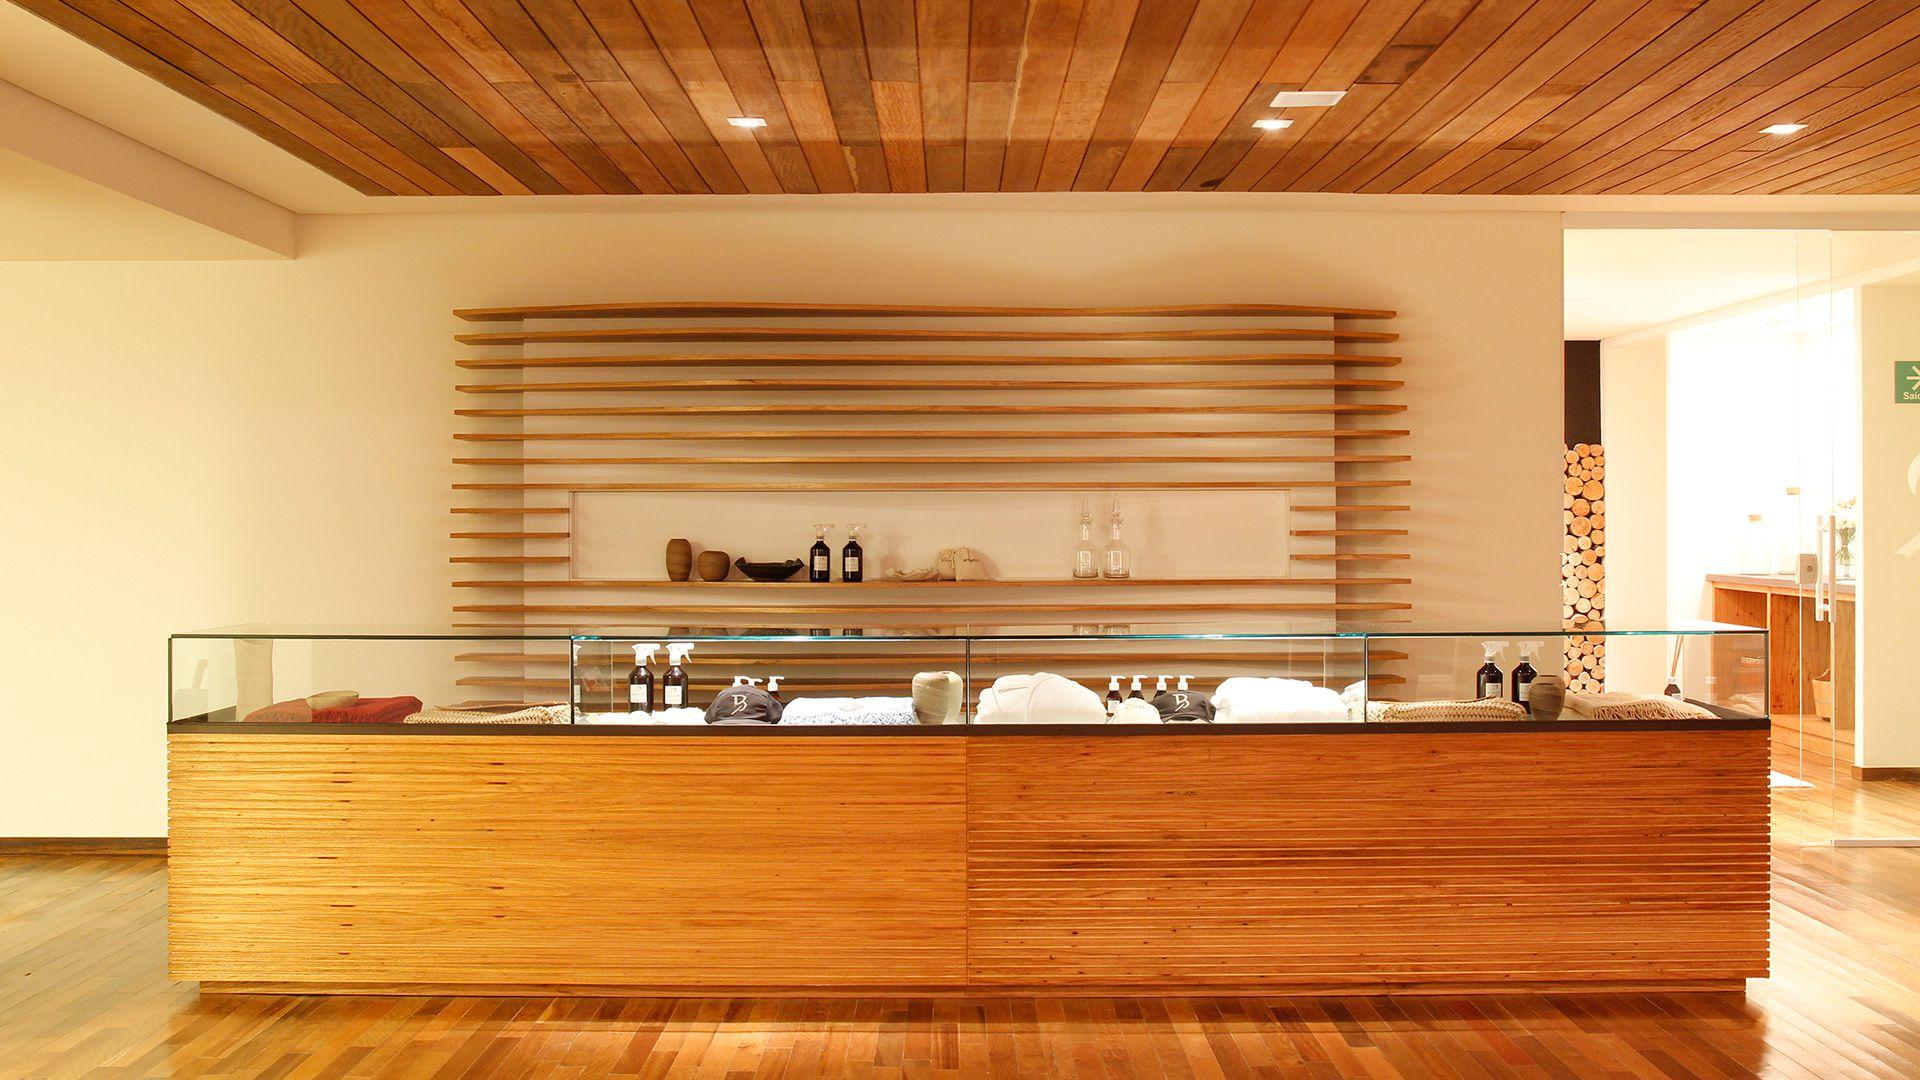 15-spa-hotanique-botanique-foto-armario-boutique-vista-frontal